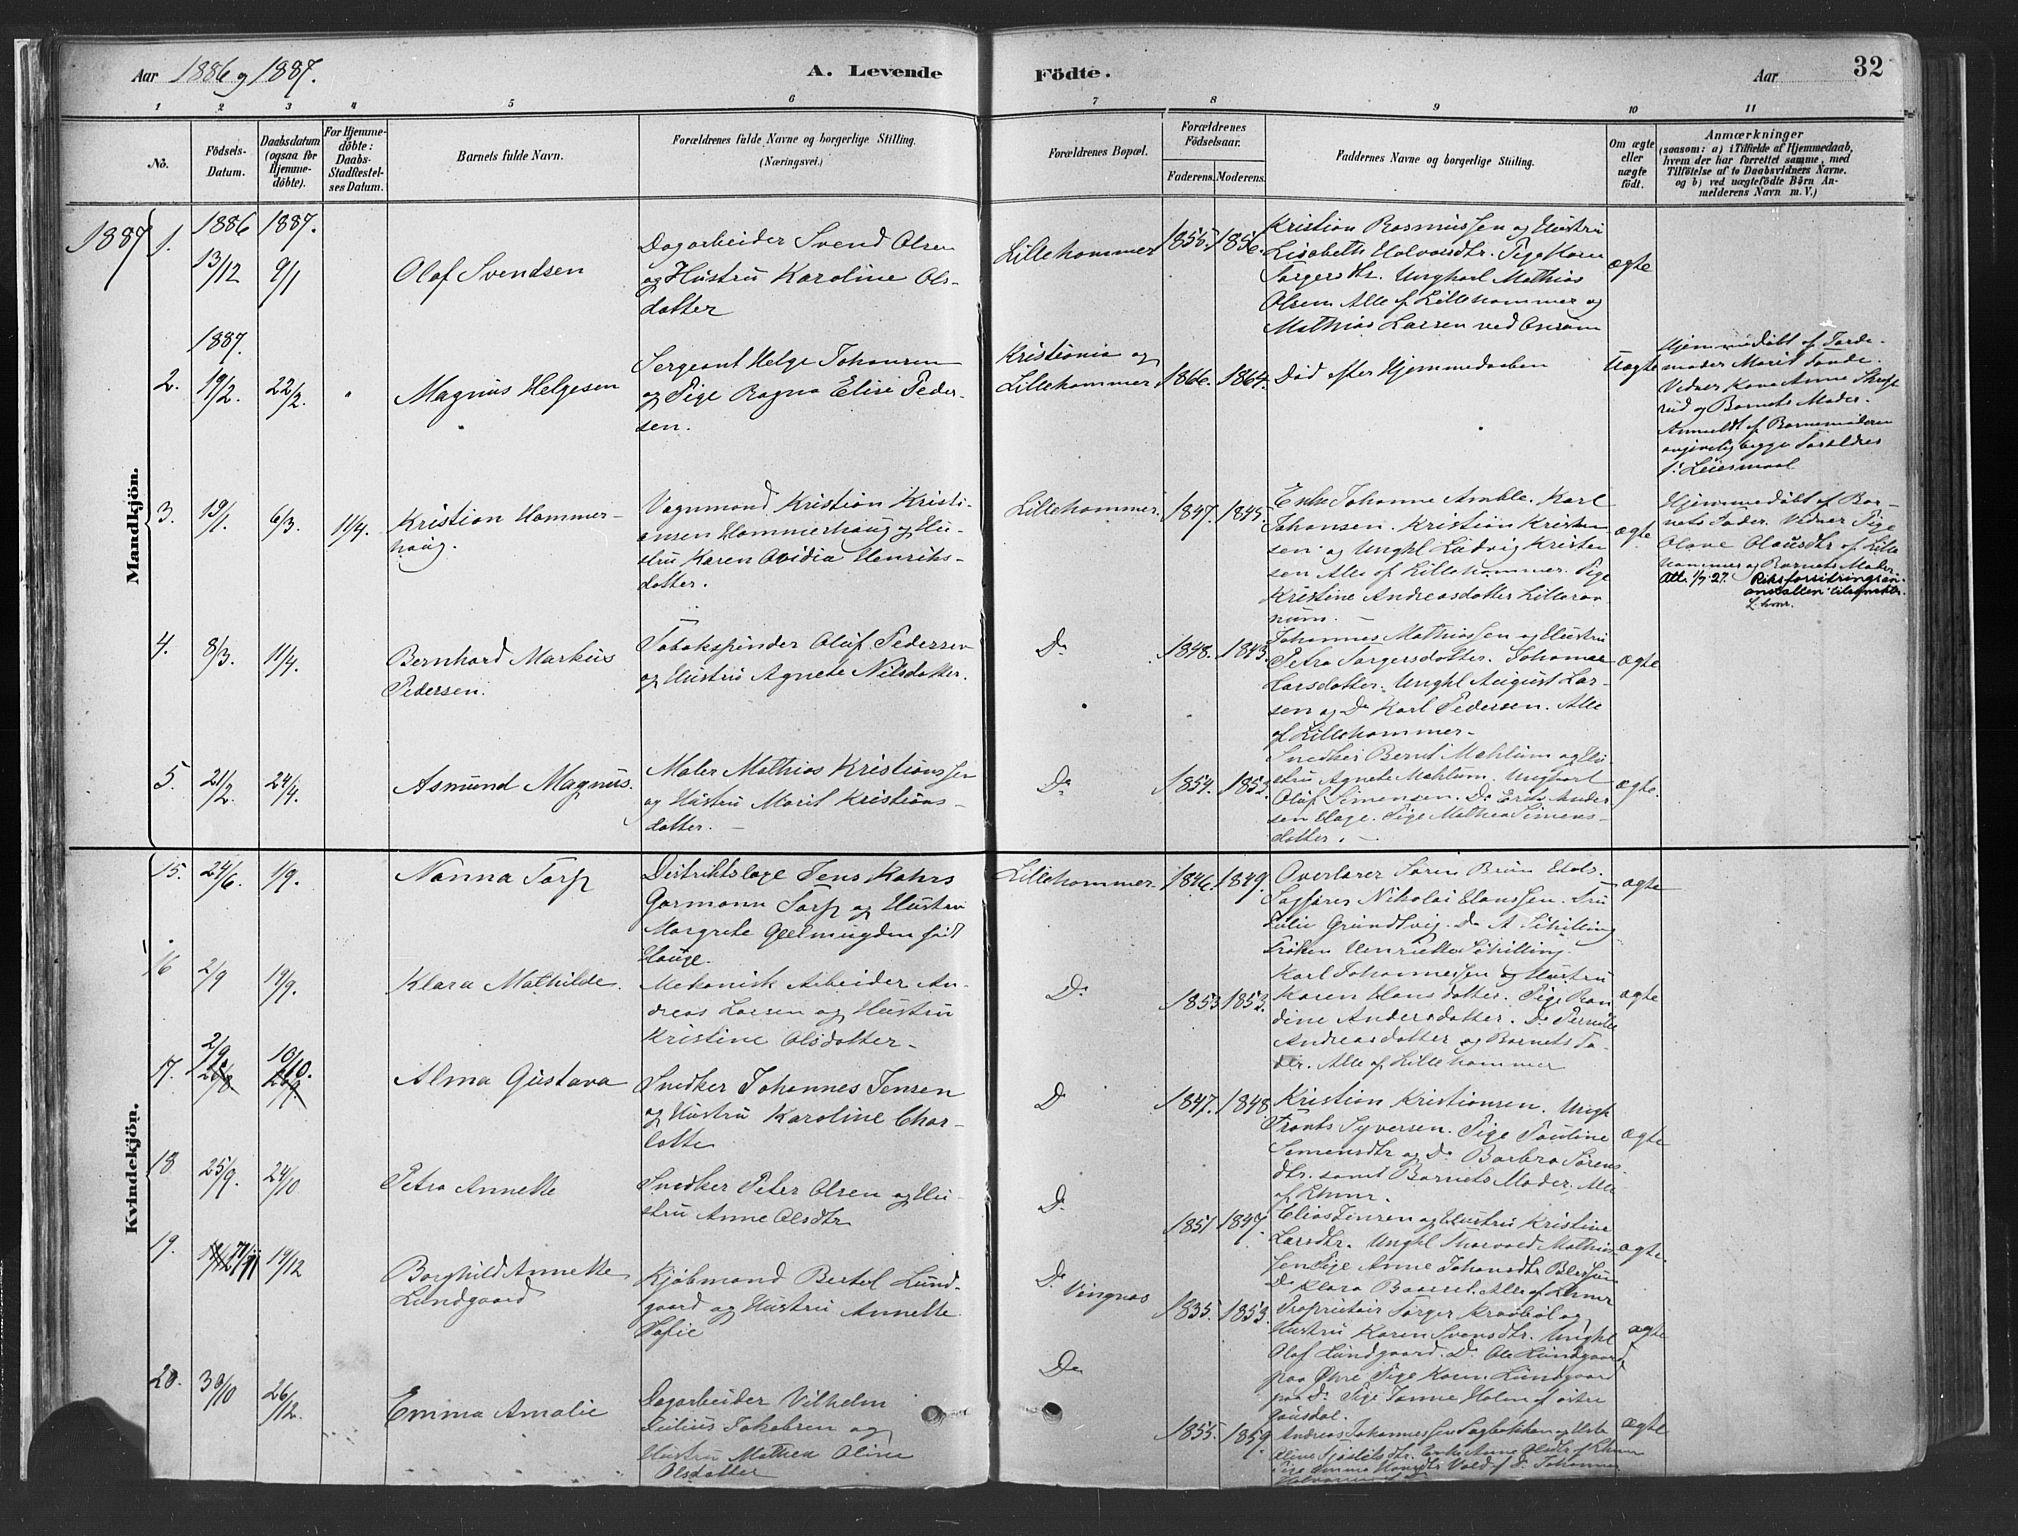 SAH, Fåberg prestekontor, Ministerialbok nr. 10, 1879-1900, s. 32